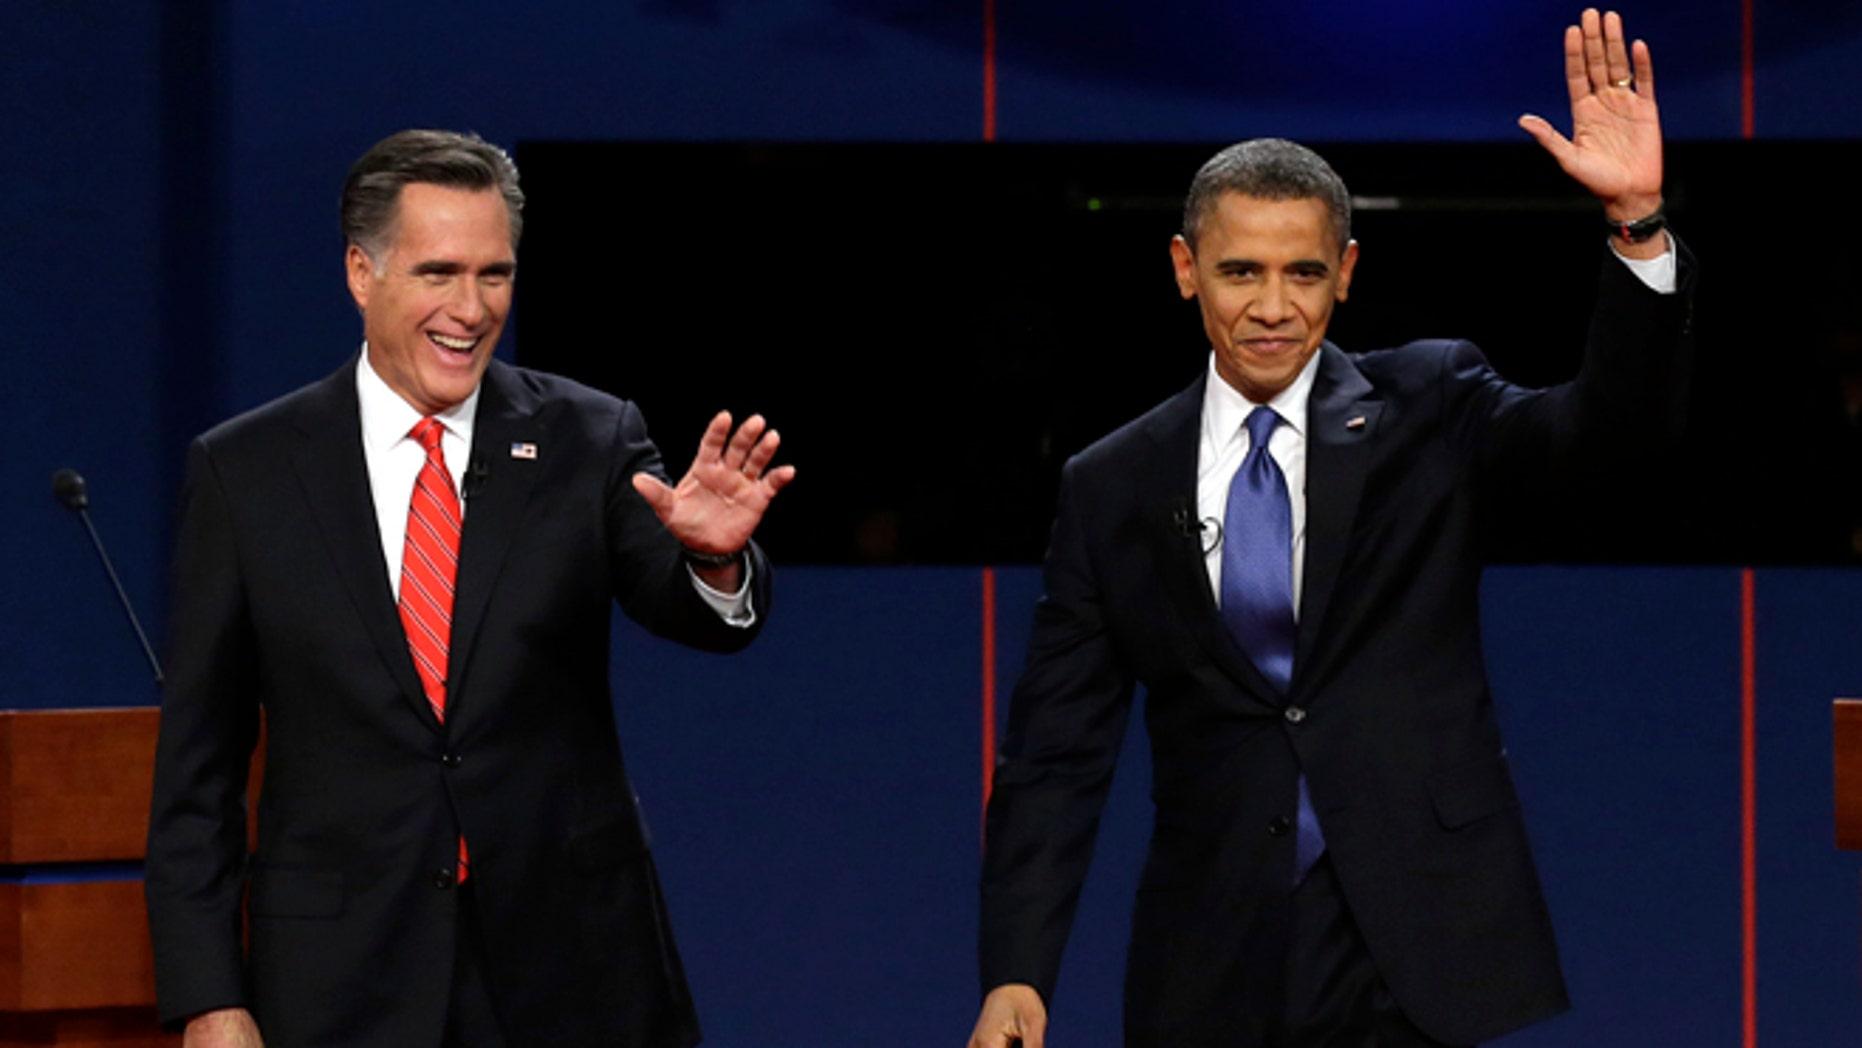 FILE: Oct. 3, 2012: Mitt Romney and President Obama during the first presidential debate at the University of Denver in Denver.